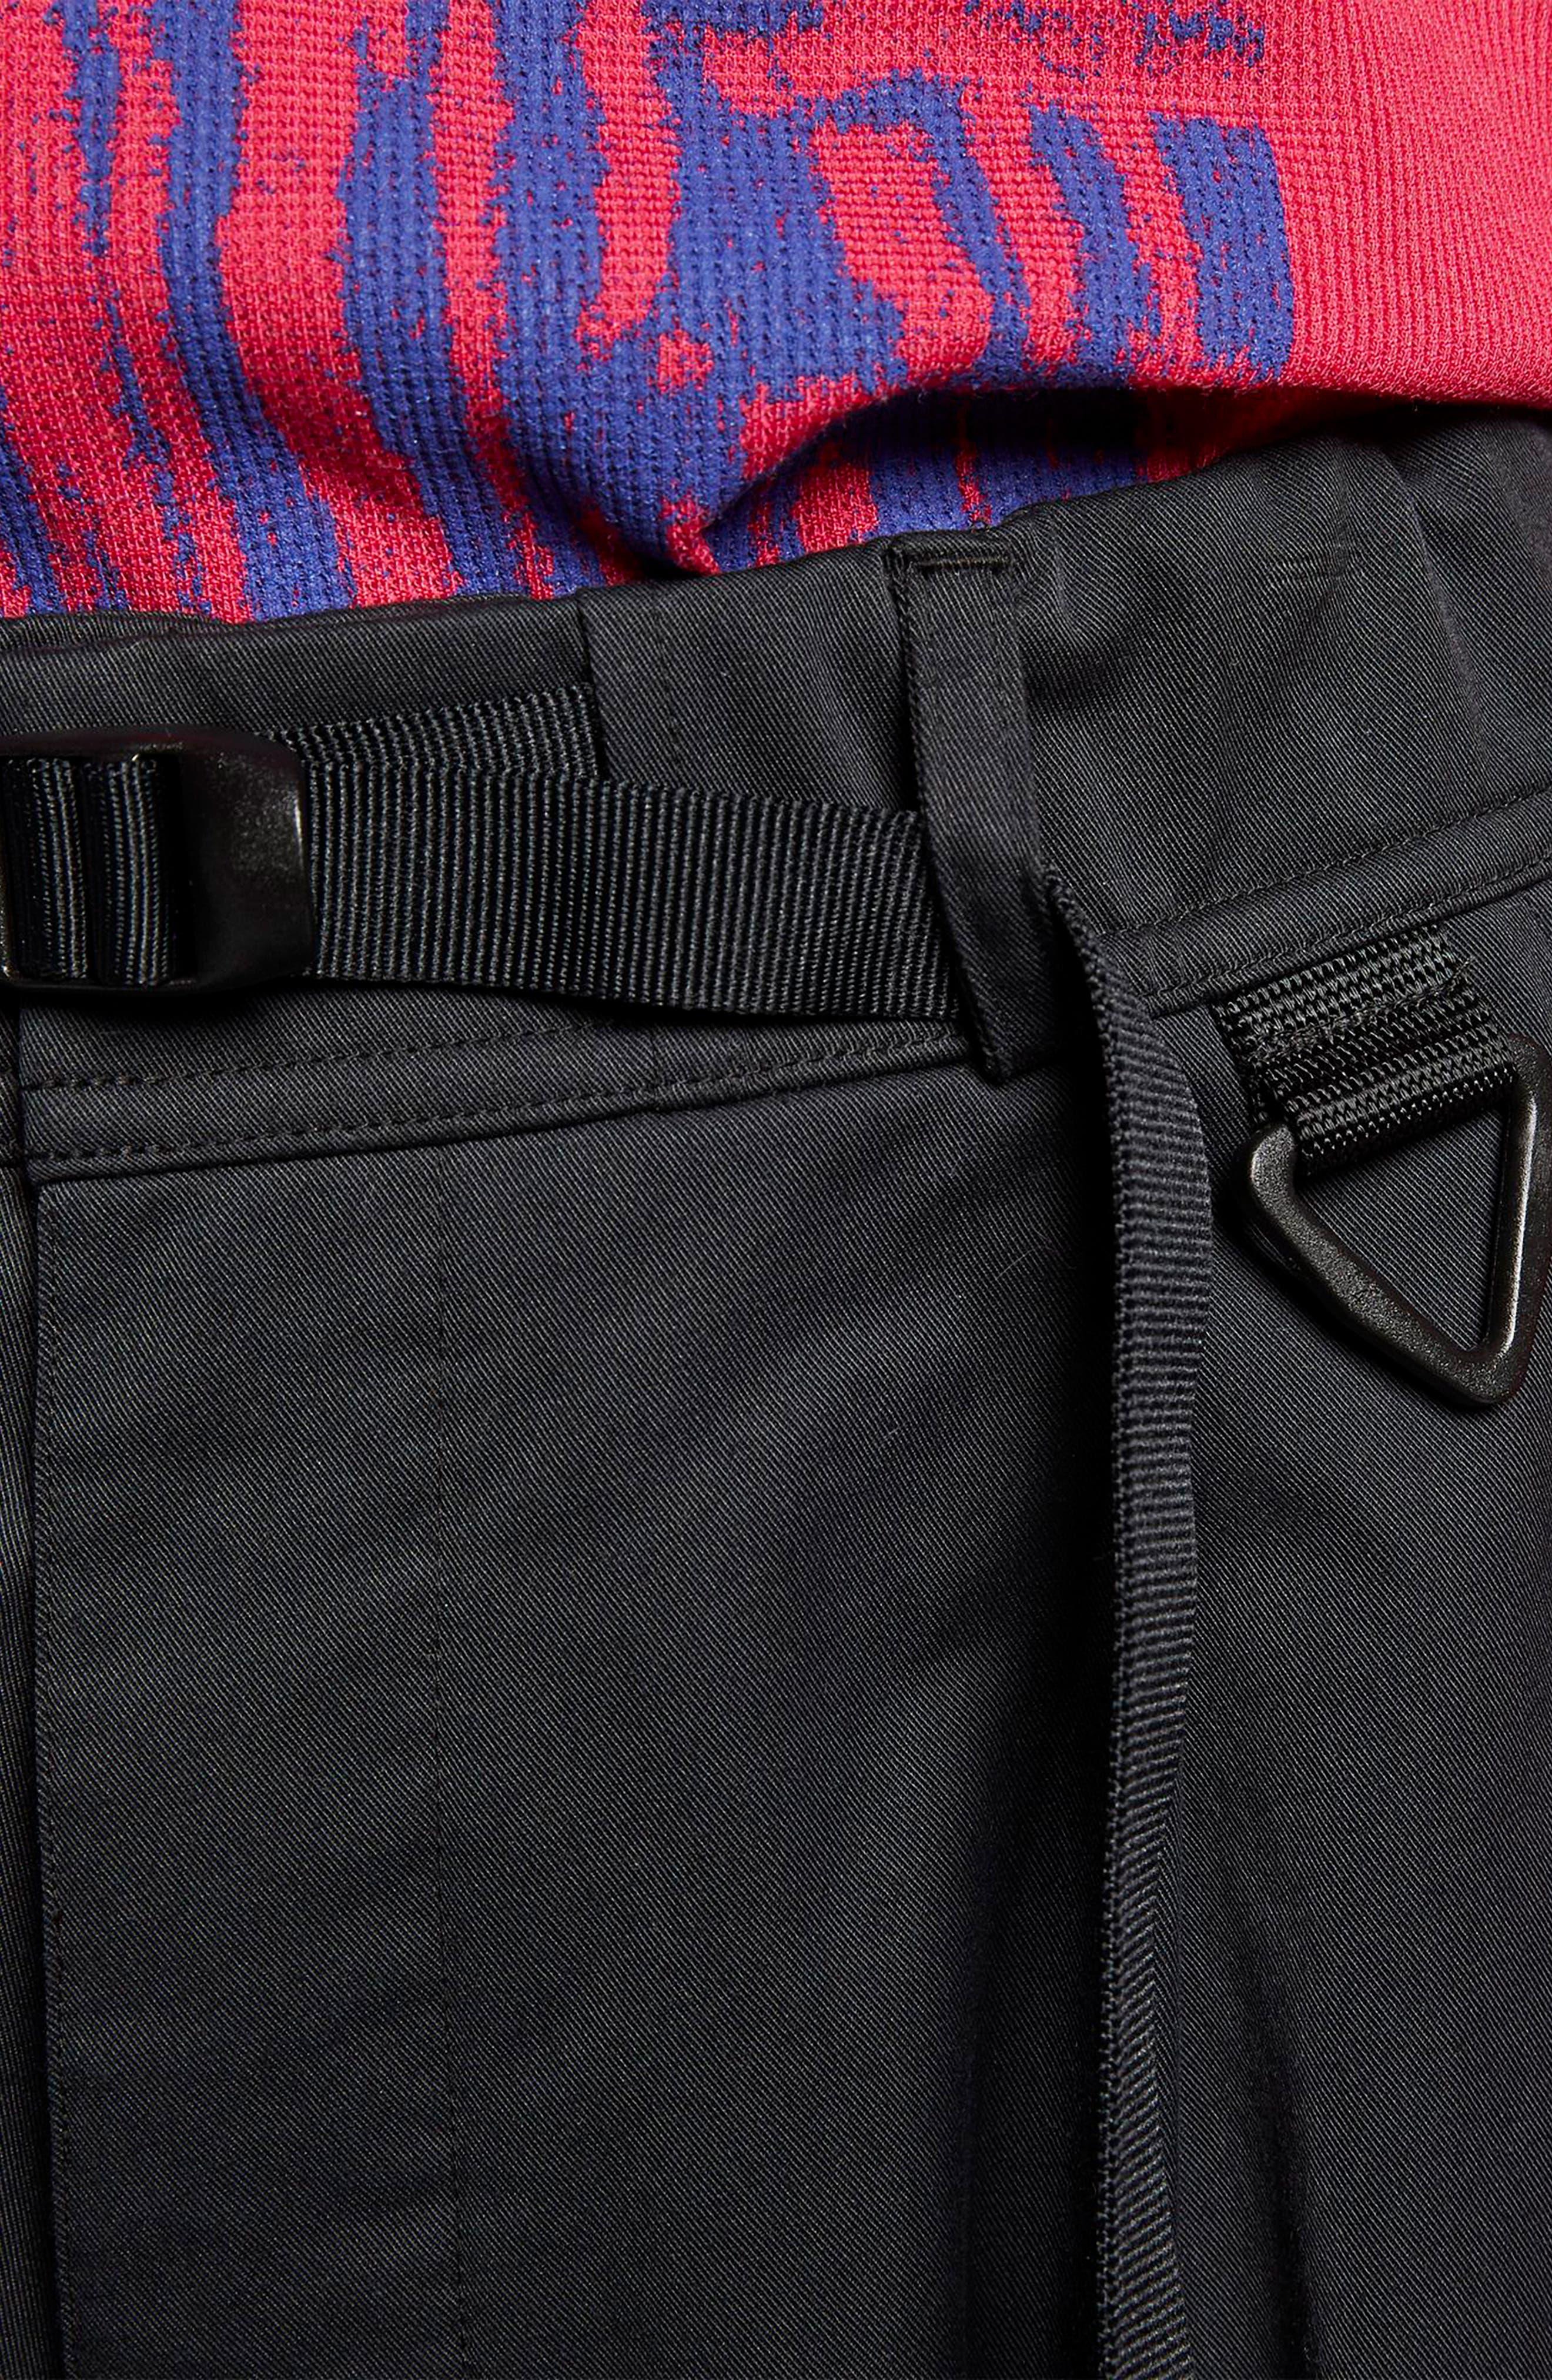 ACG Men's Cargo Pants,                             Alternate thumbnail 8, color,                             BLACK